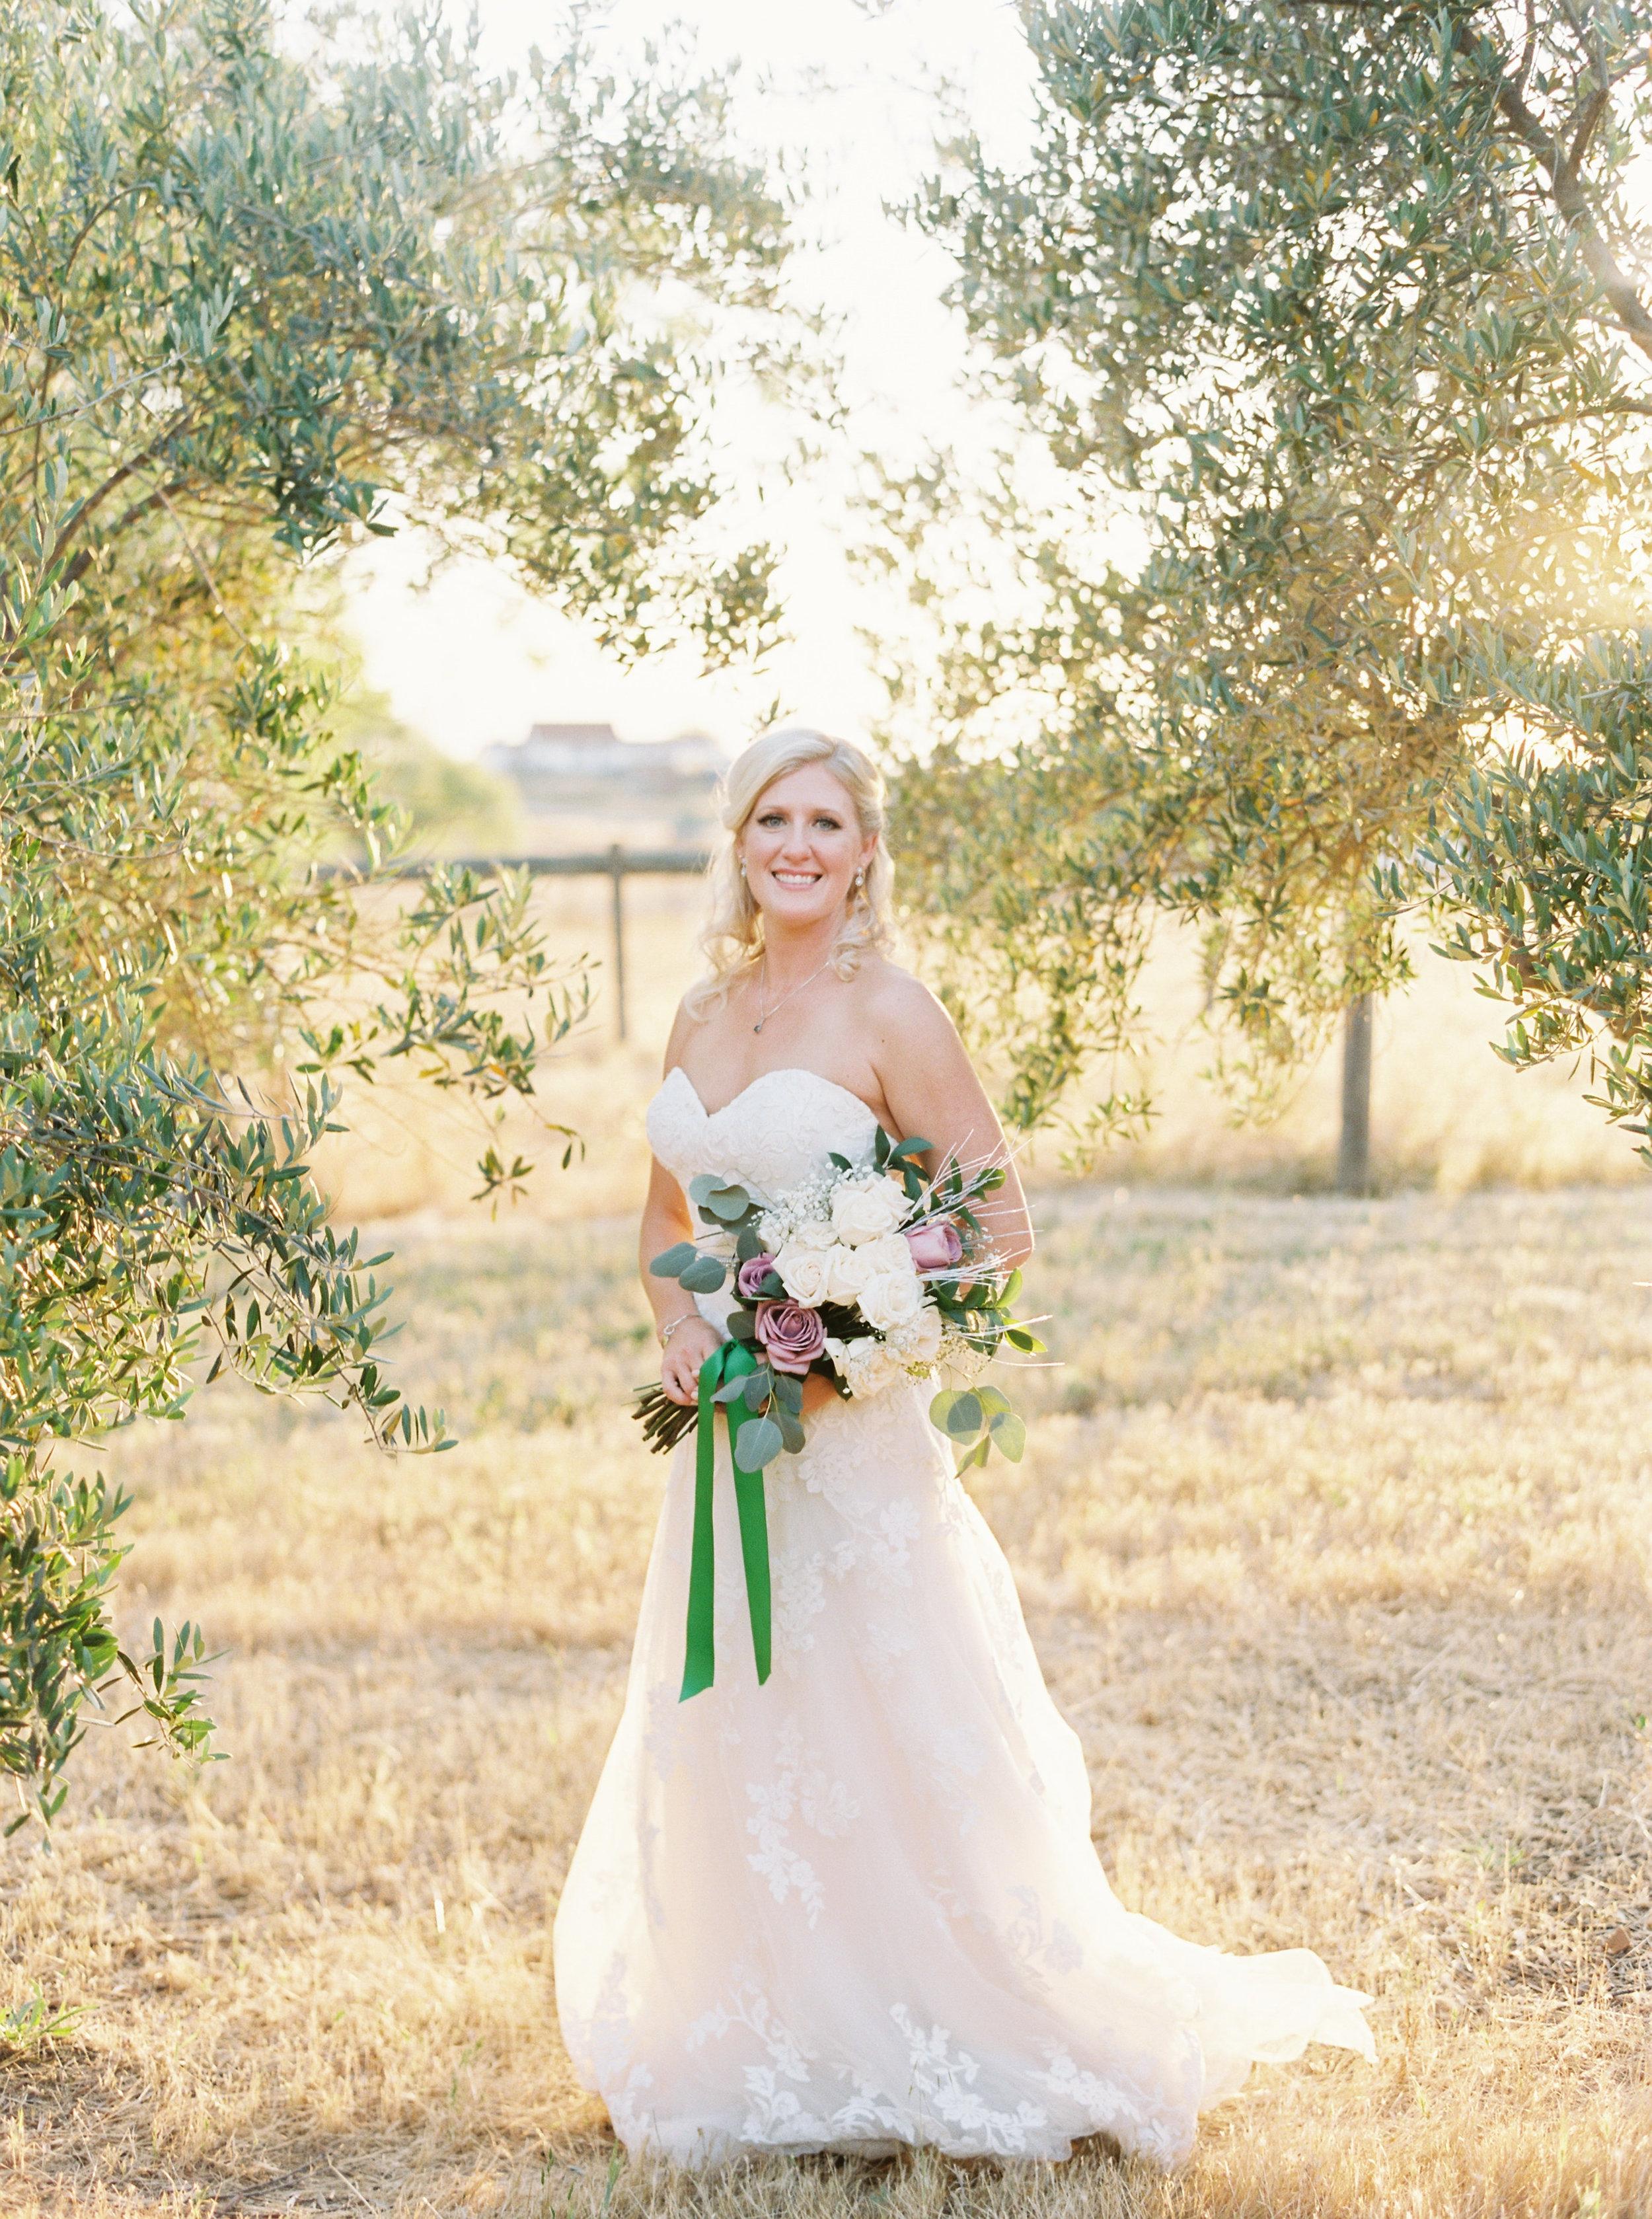 wolfe-heights-event-center-wedding-sacramento-california-wedding-28.jpg